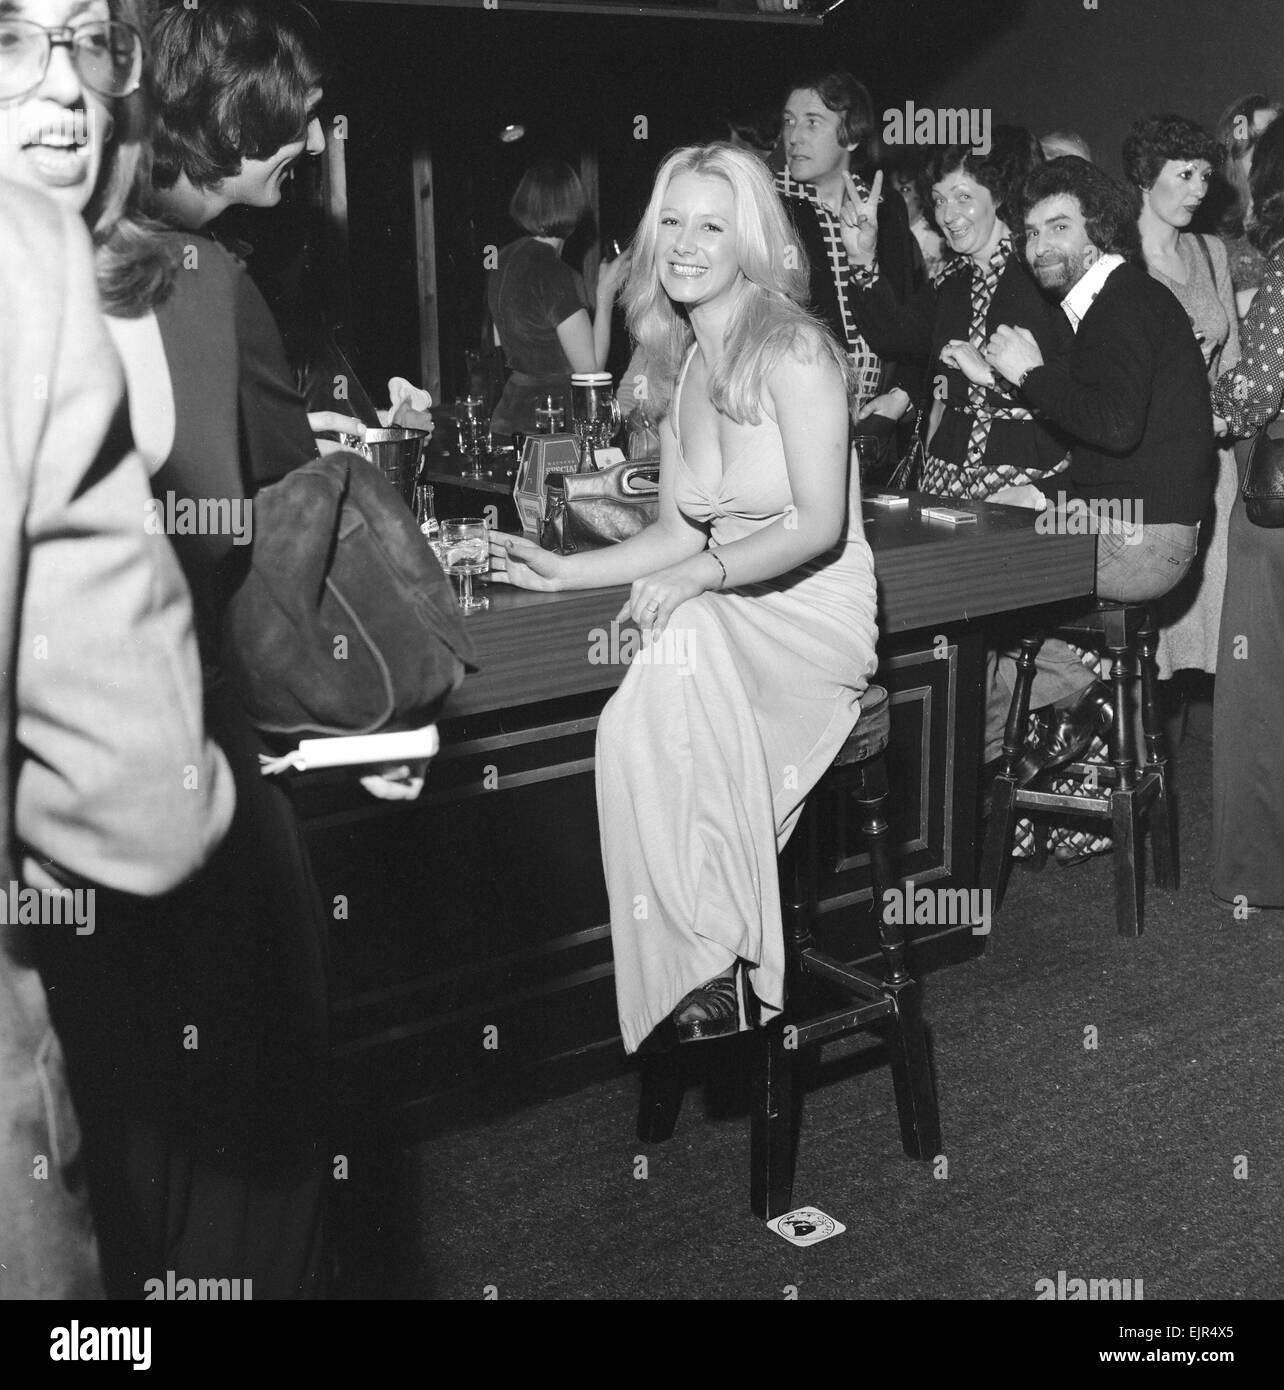 A Girl Sitting Alone At The Bar Inside The Nightclub Slack